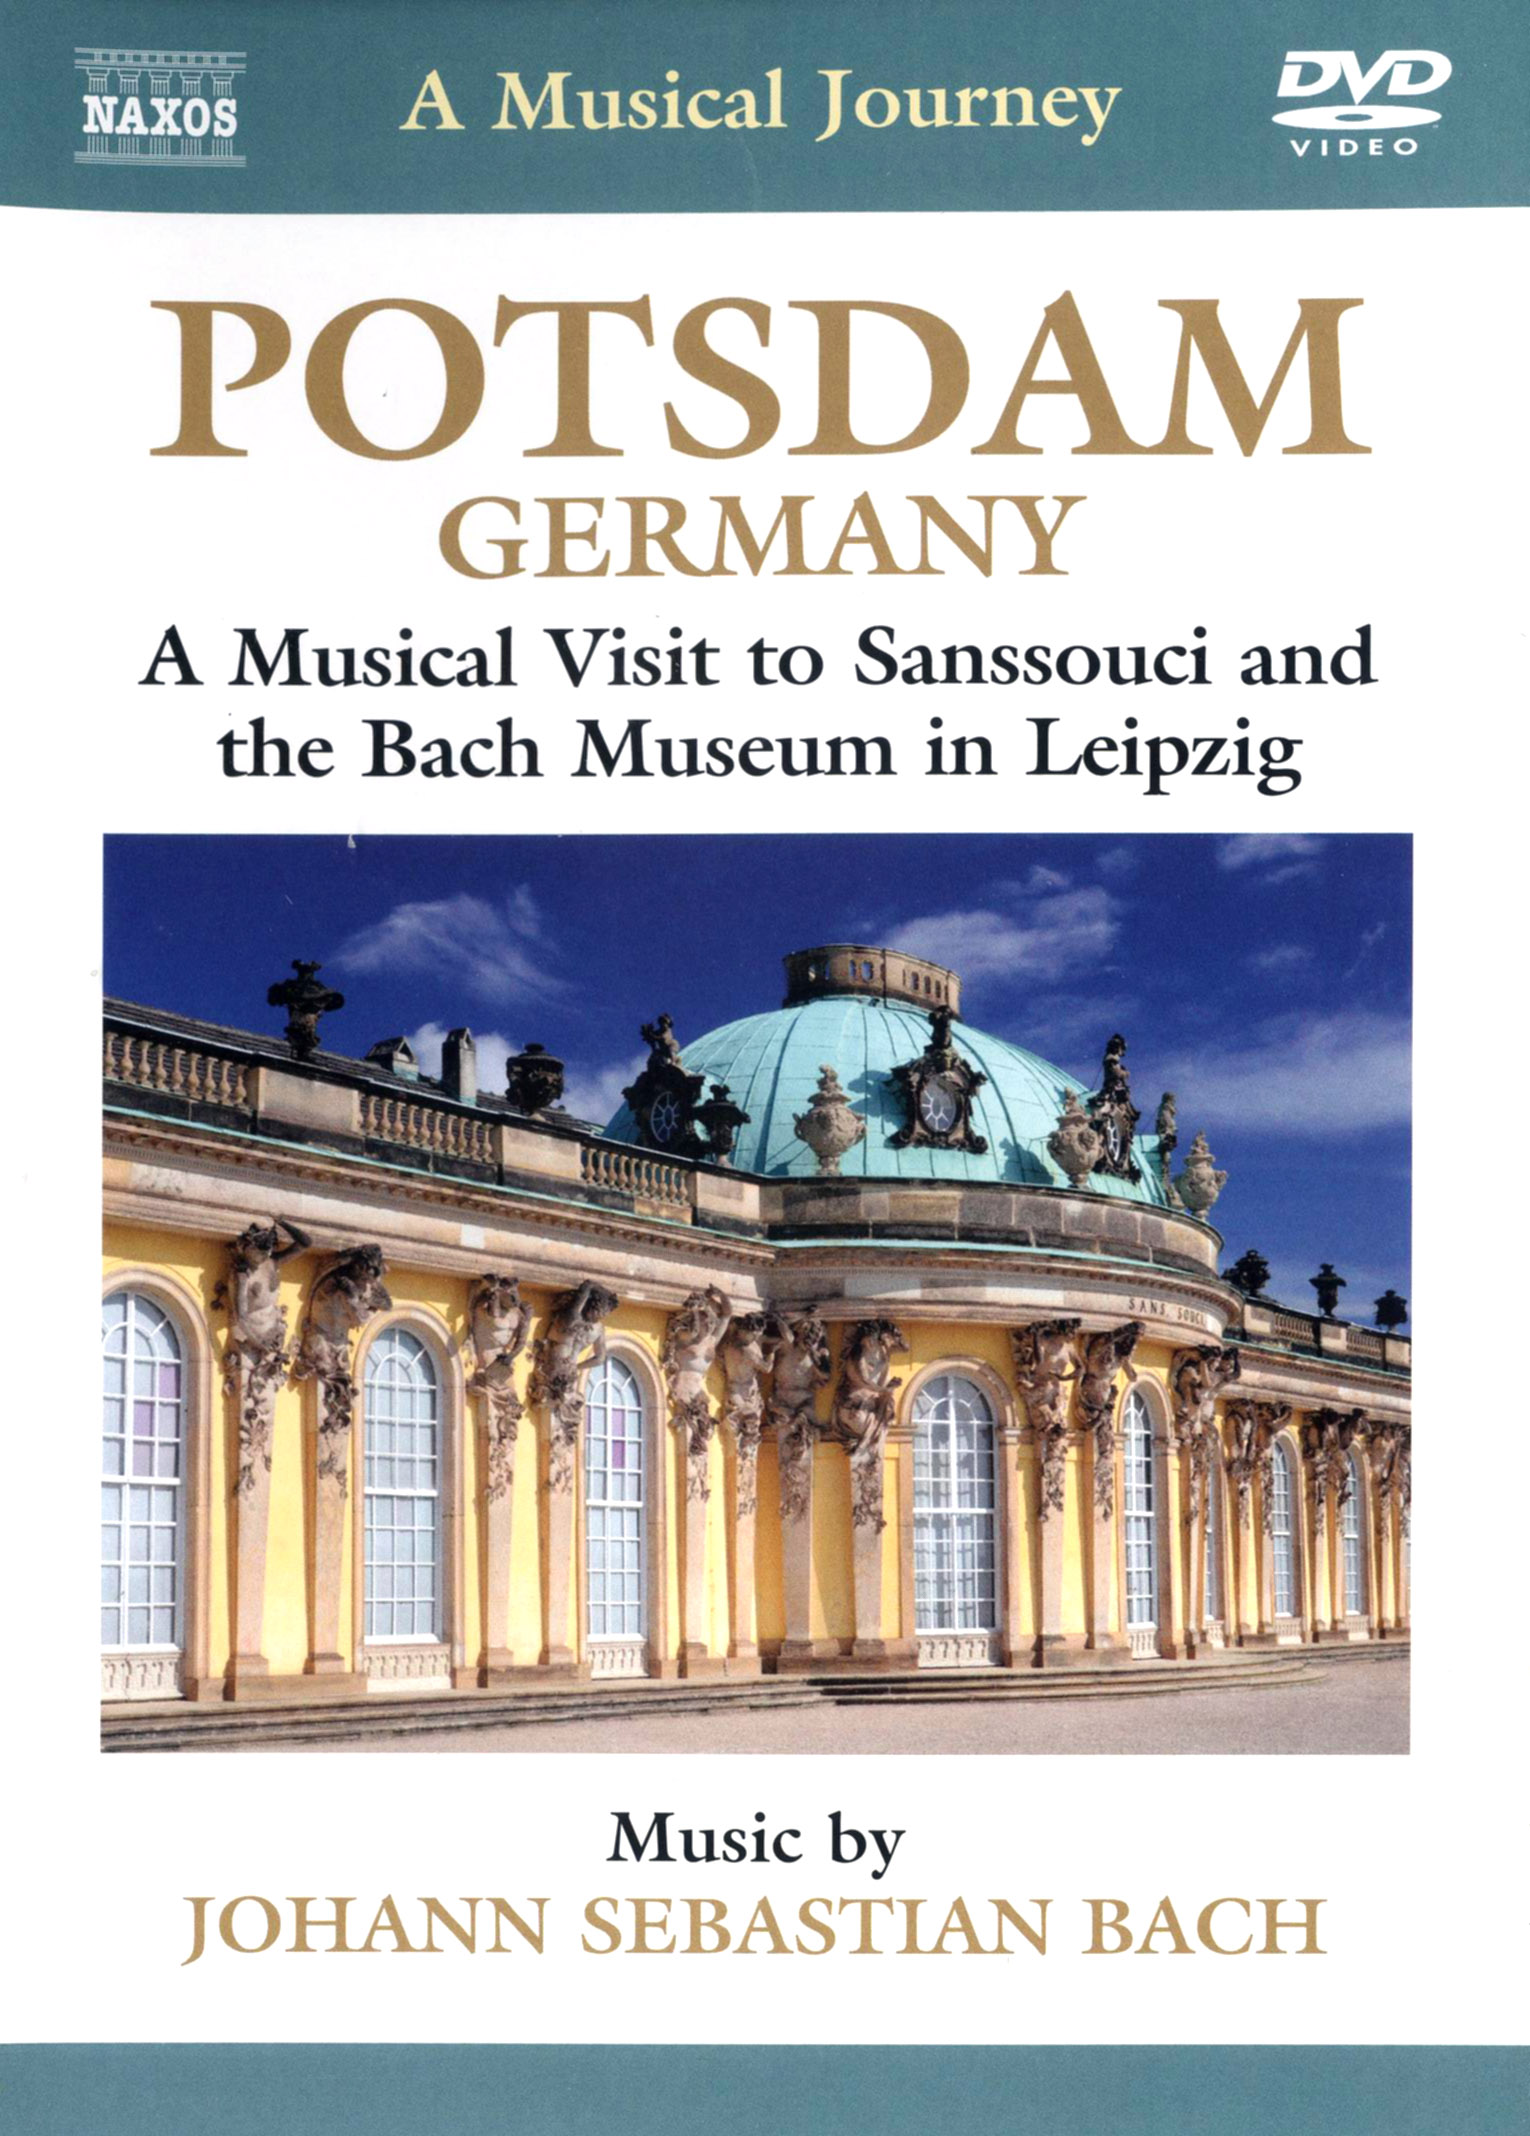 A Musical Journey: Potsdam, Germany